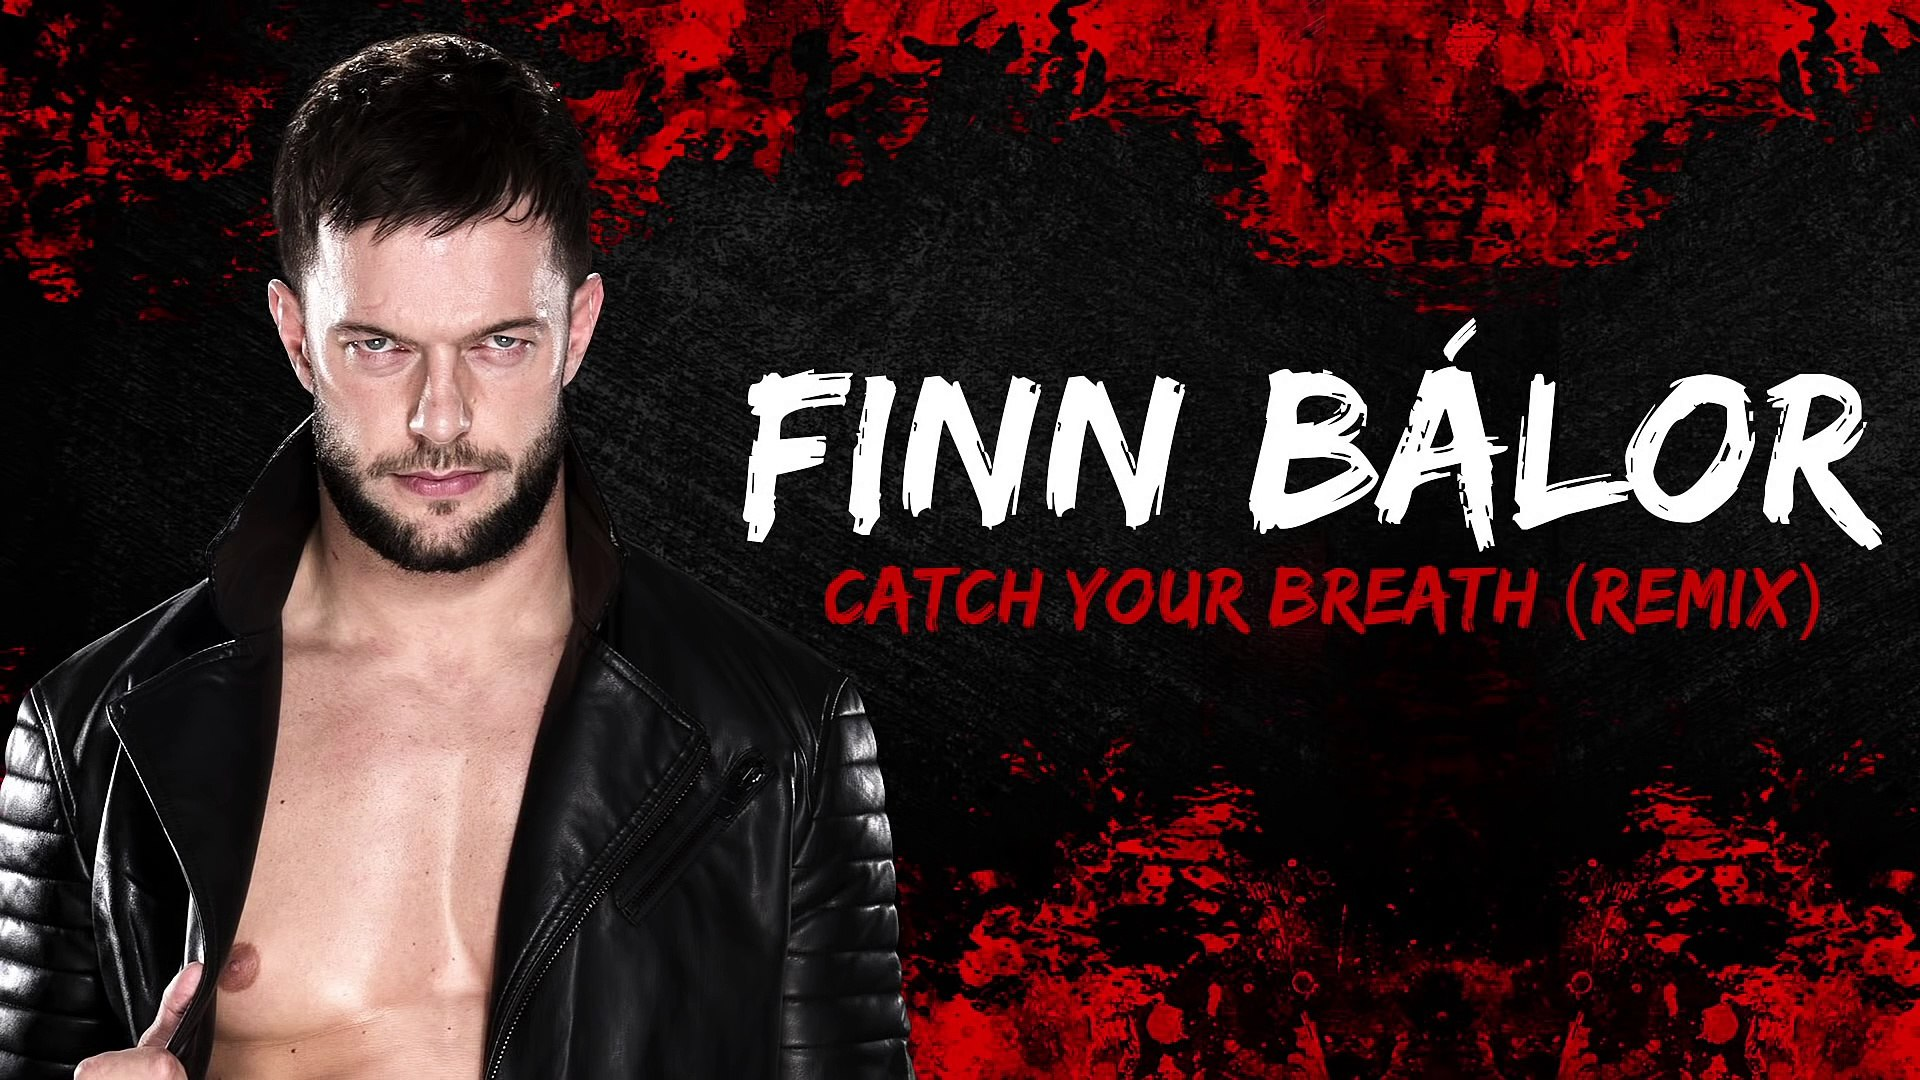 Finn Bálor: Catch Your Breath (Remix) (Official Theme)